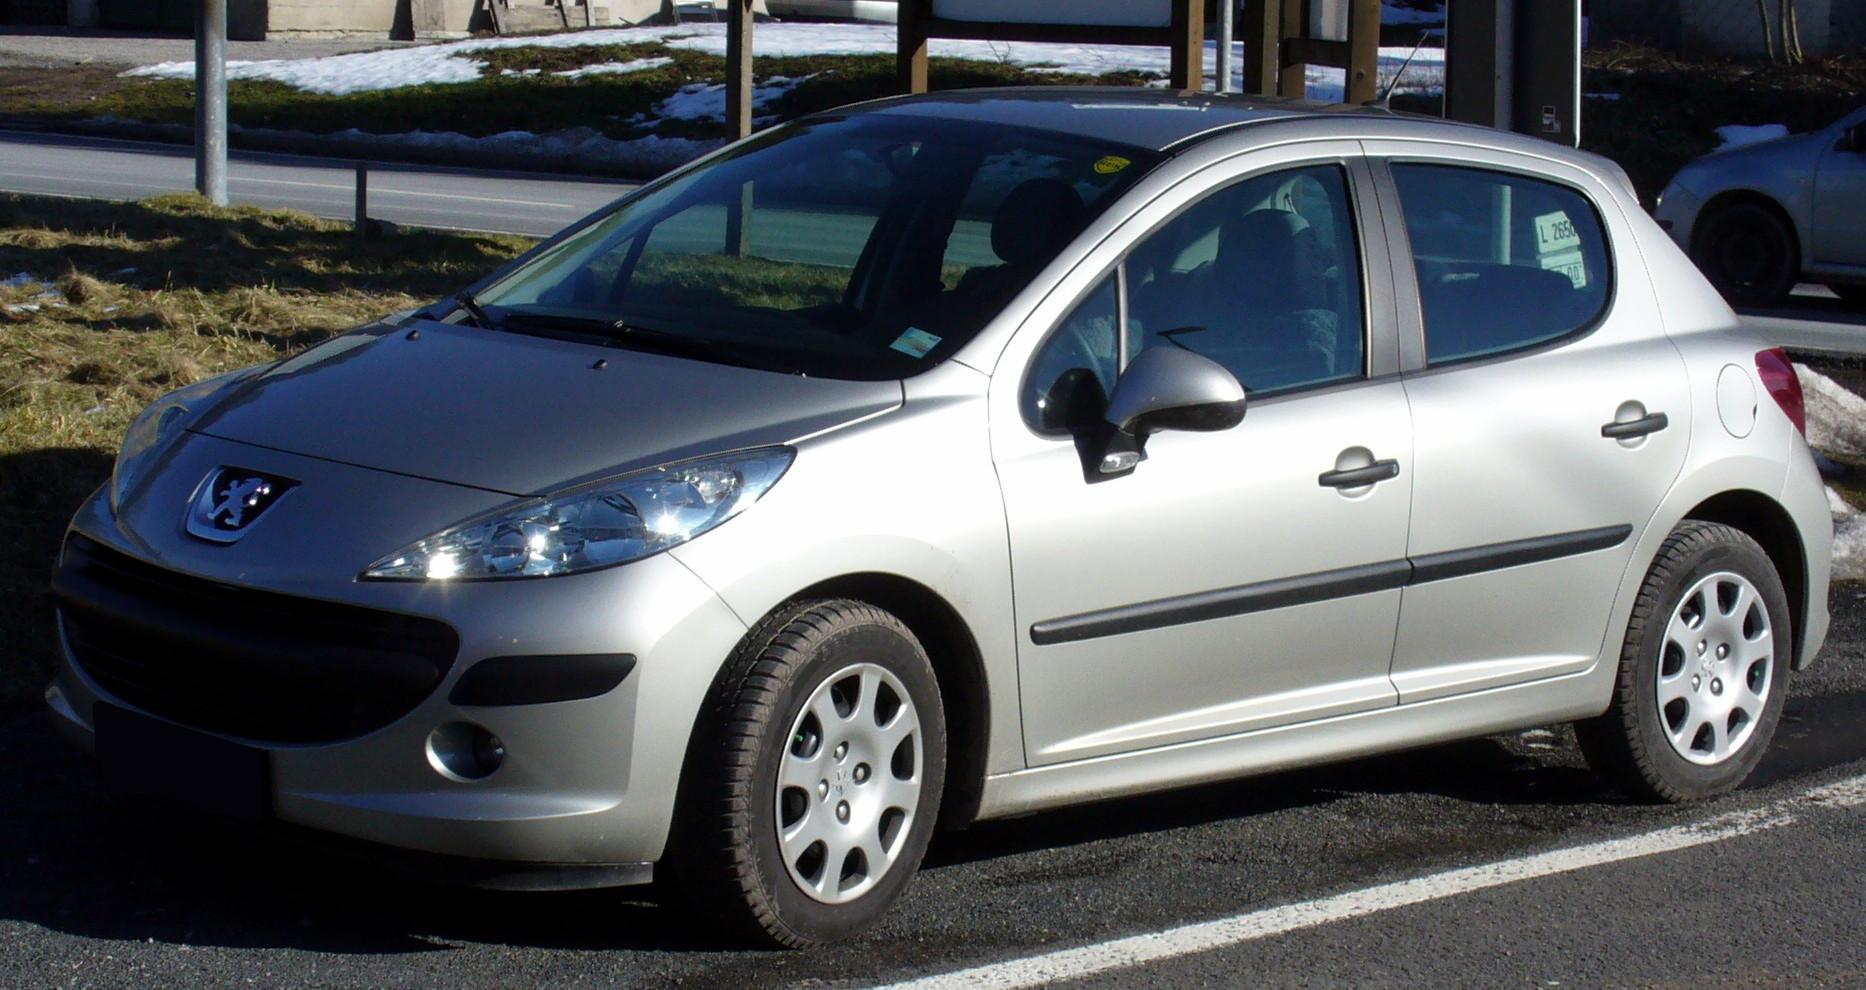 File:Peugeot 207 5-Türer.jpg - Wikipedia